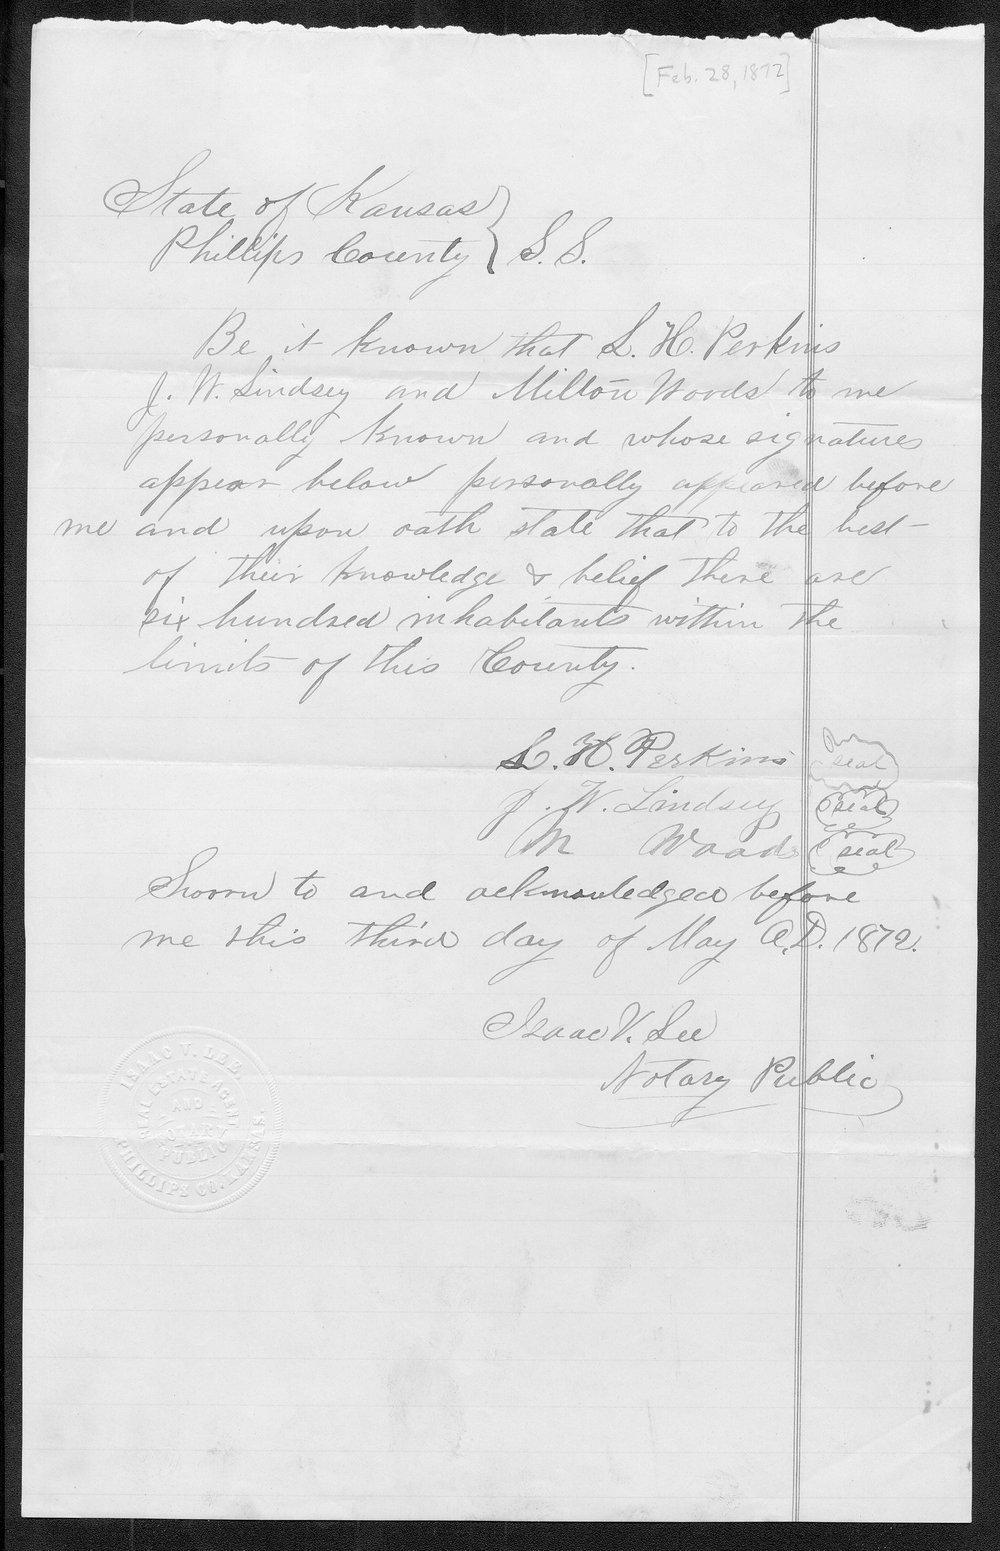 Phillips County organization records - 1